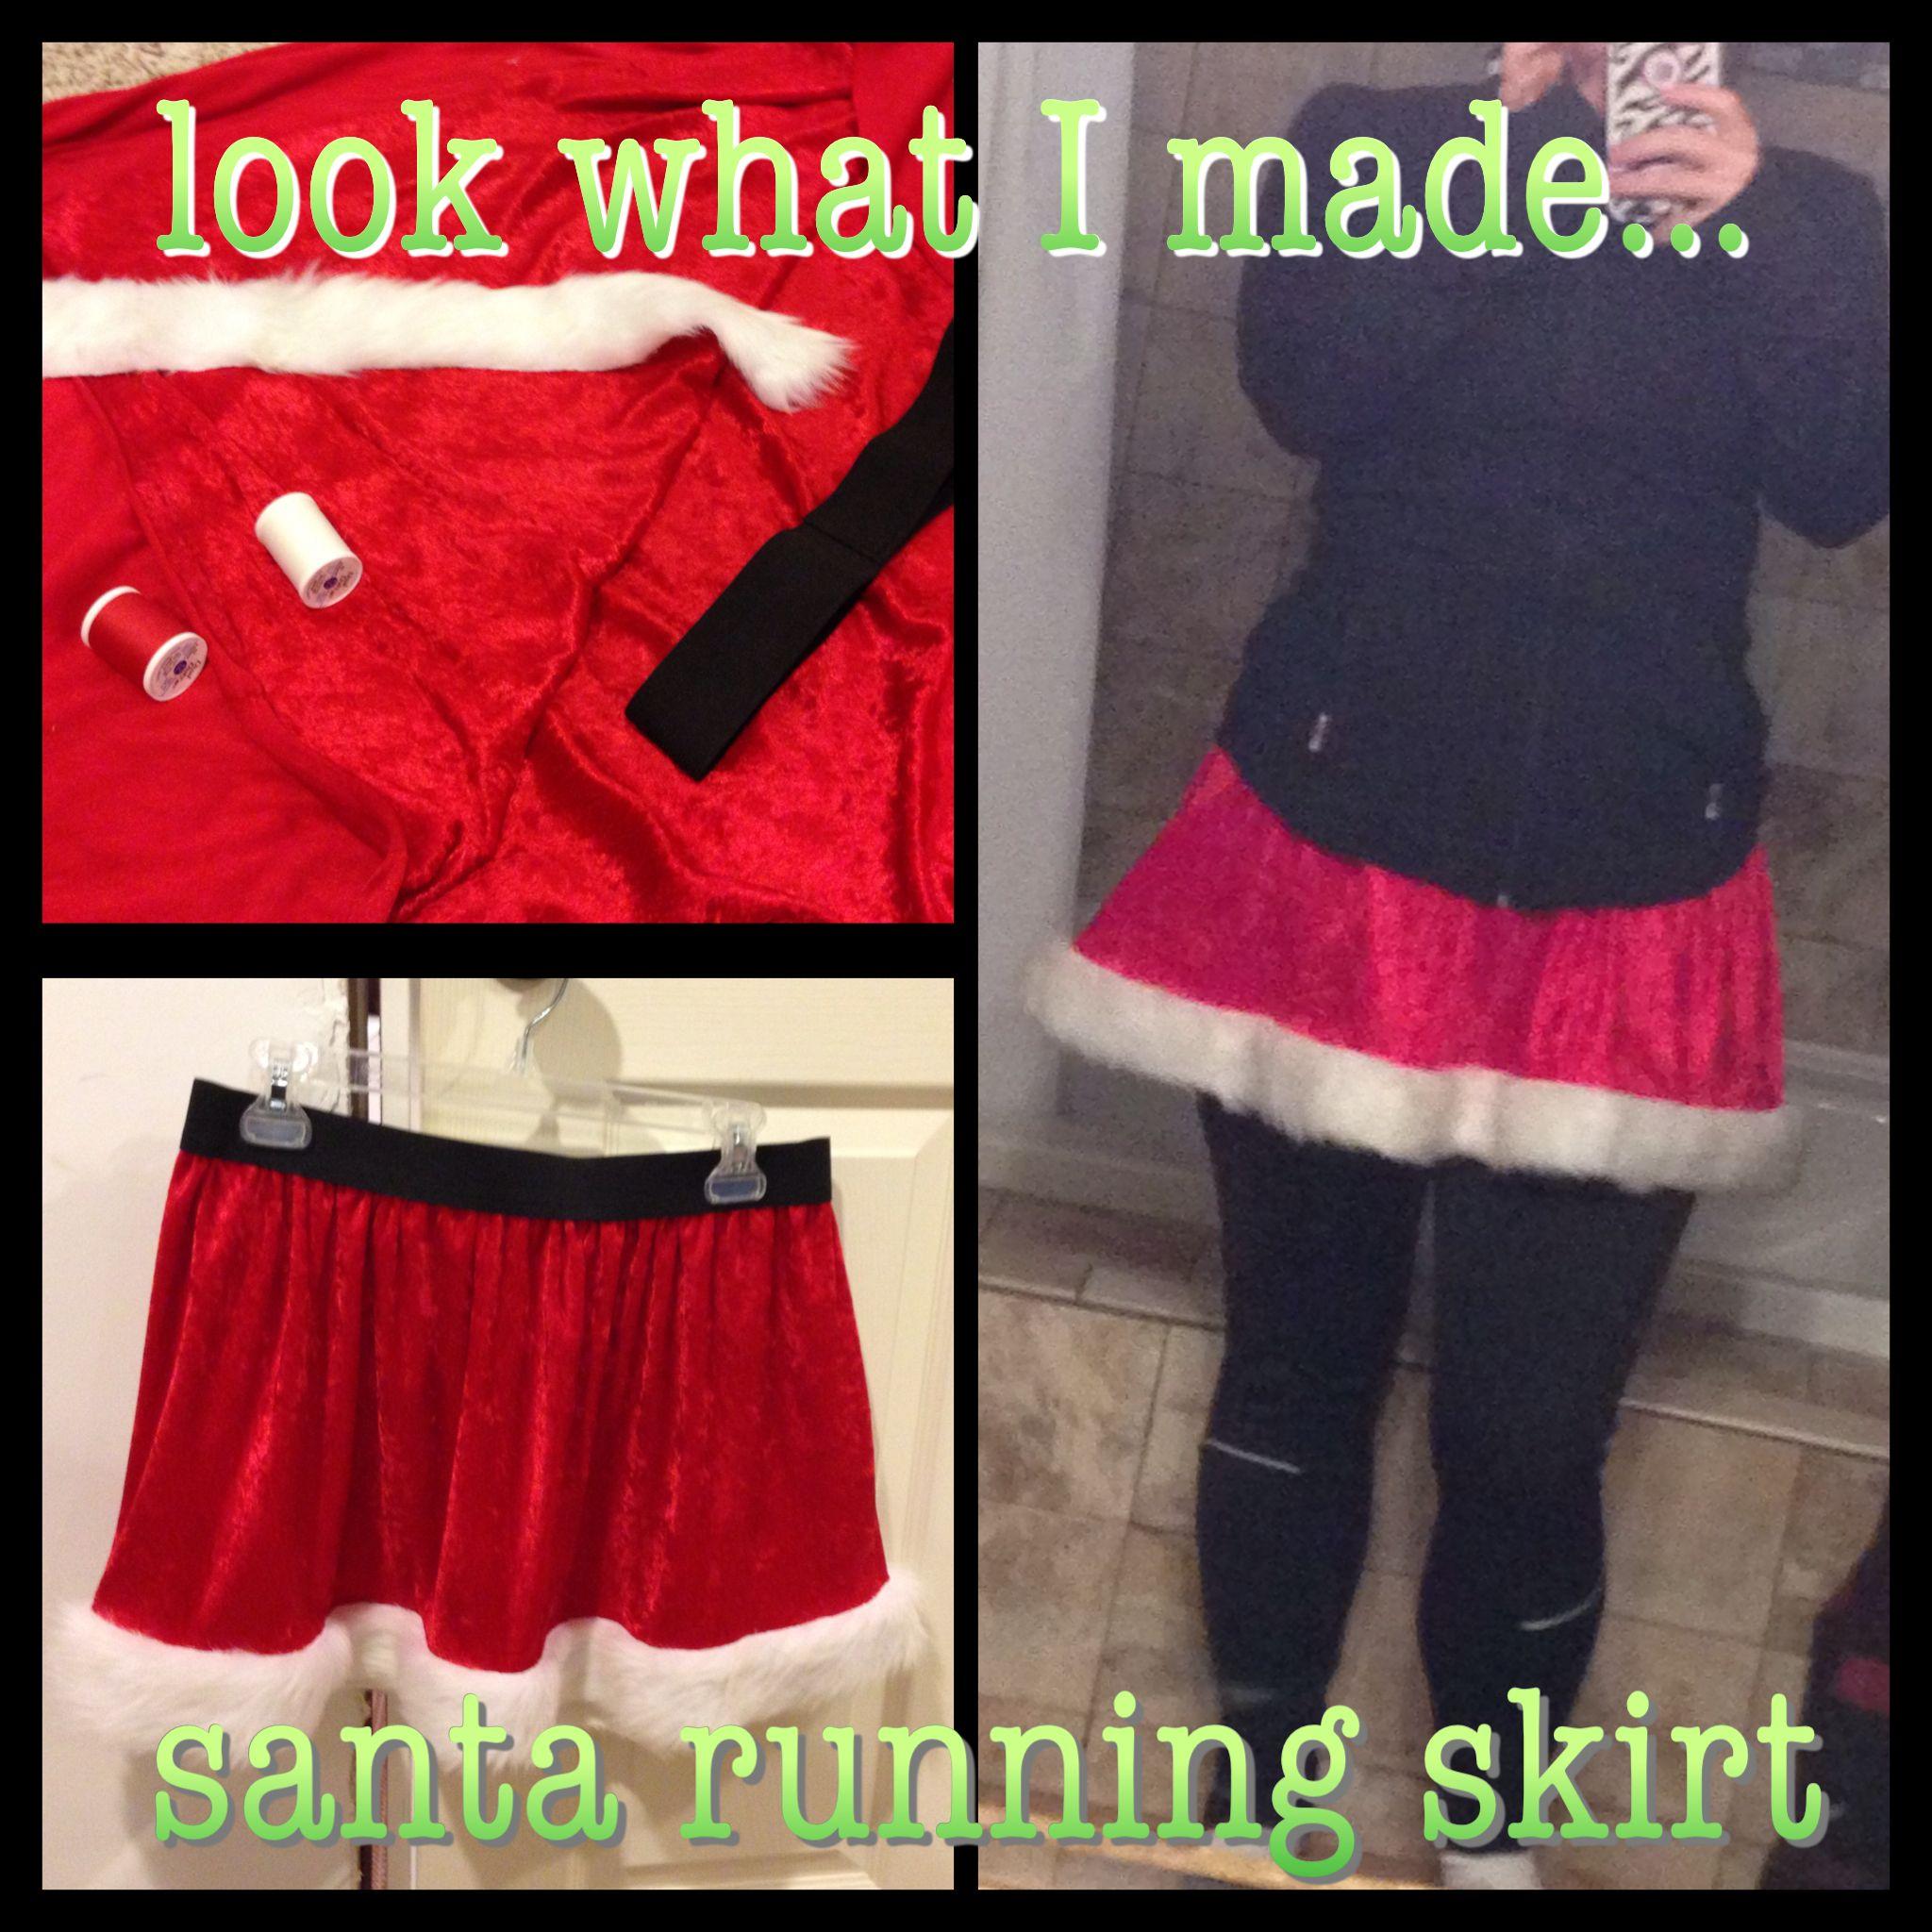 bc8f37e4a3b03 Pin by Jennifer VanAlstine on Running costumes | Running skirts ...